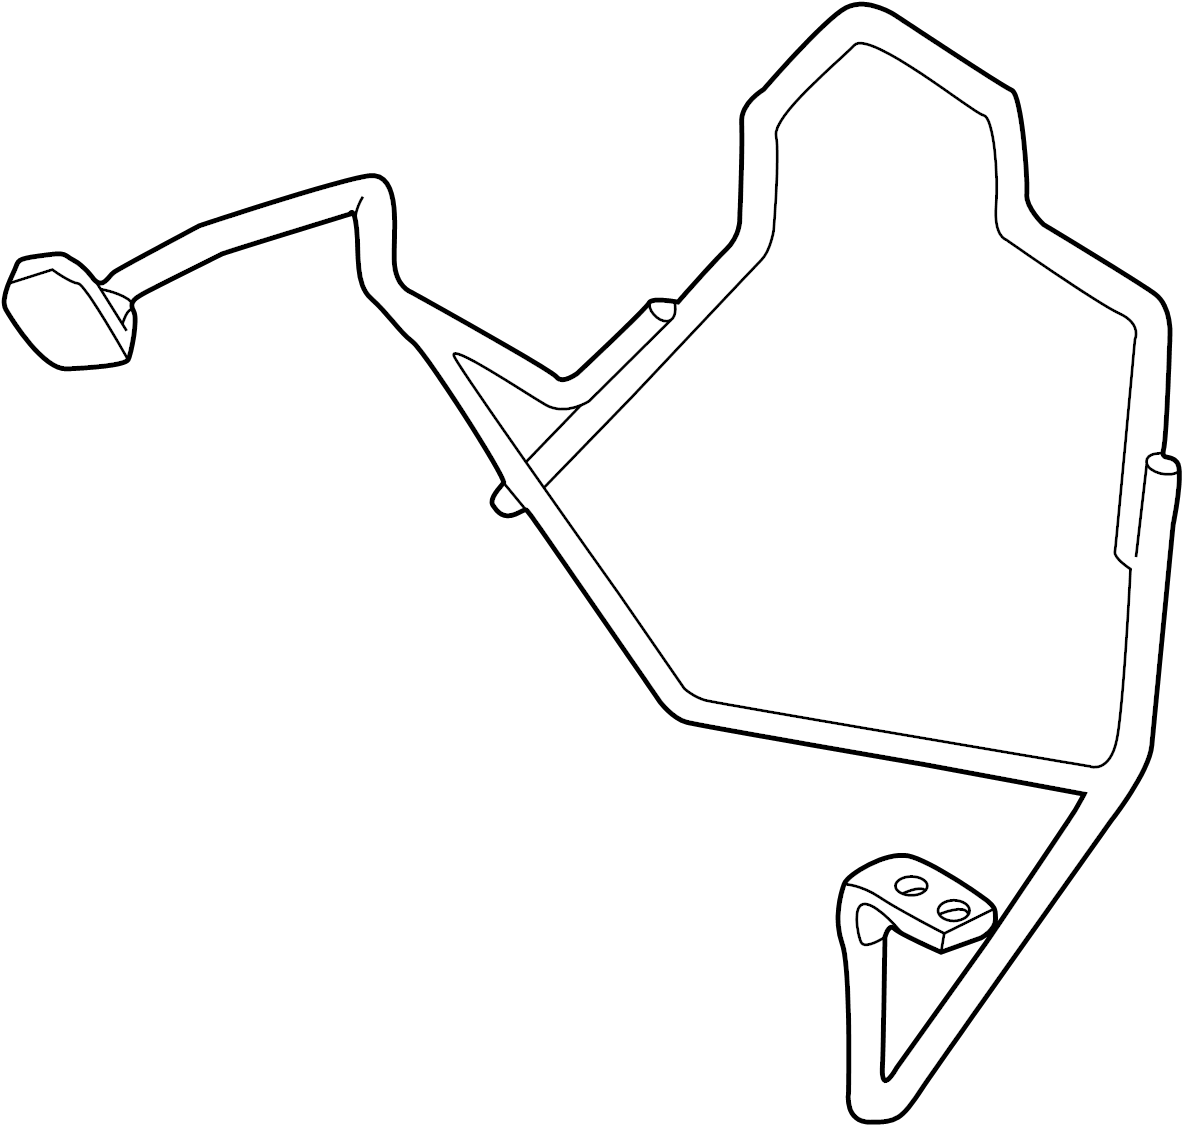 2002 hyundai santa fe parts diagram alternator wiring carrier assembly spare wheel